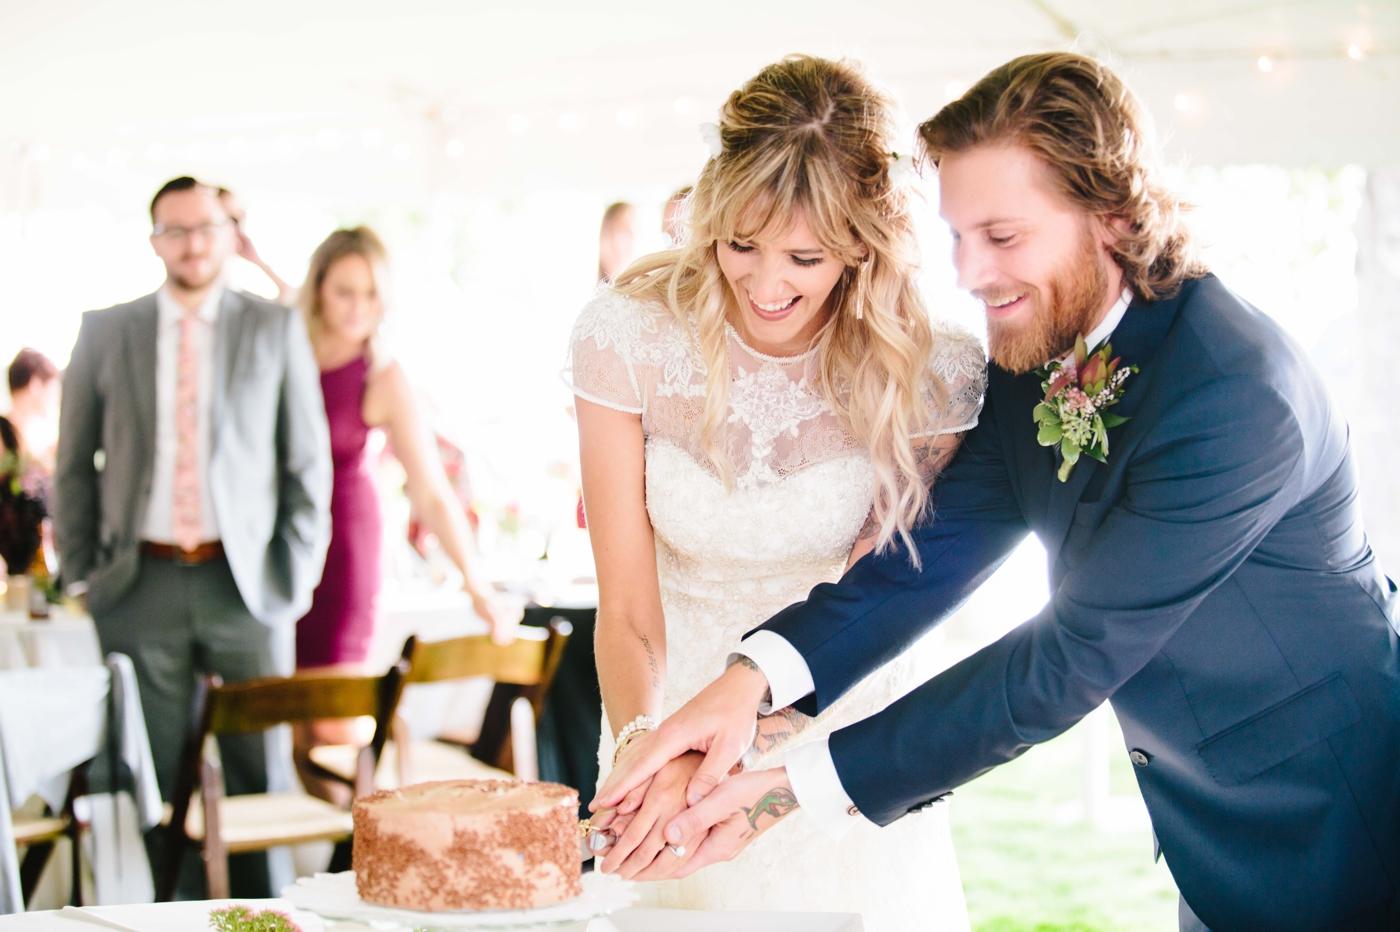 chicago-fine-art-wedding-photography-chriskelsey41